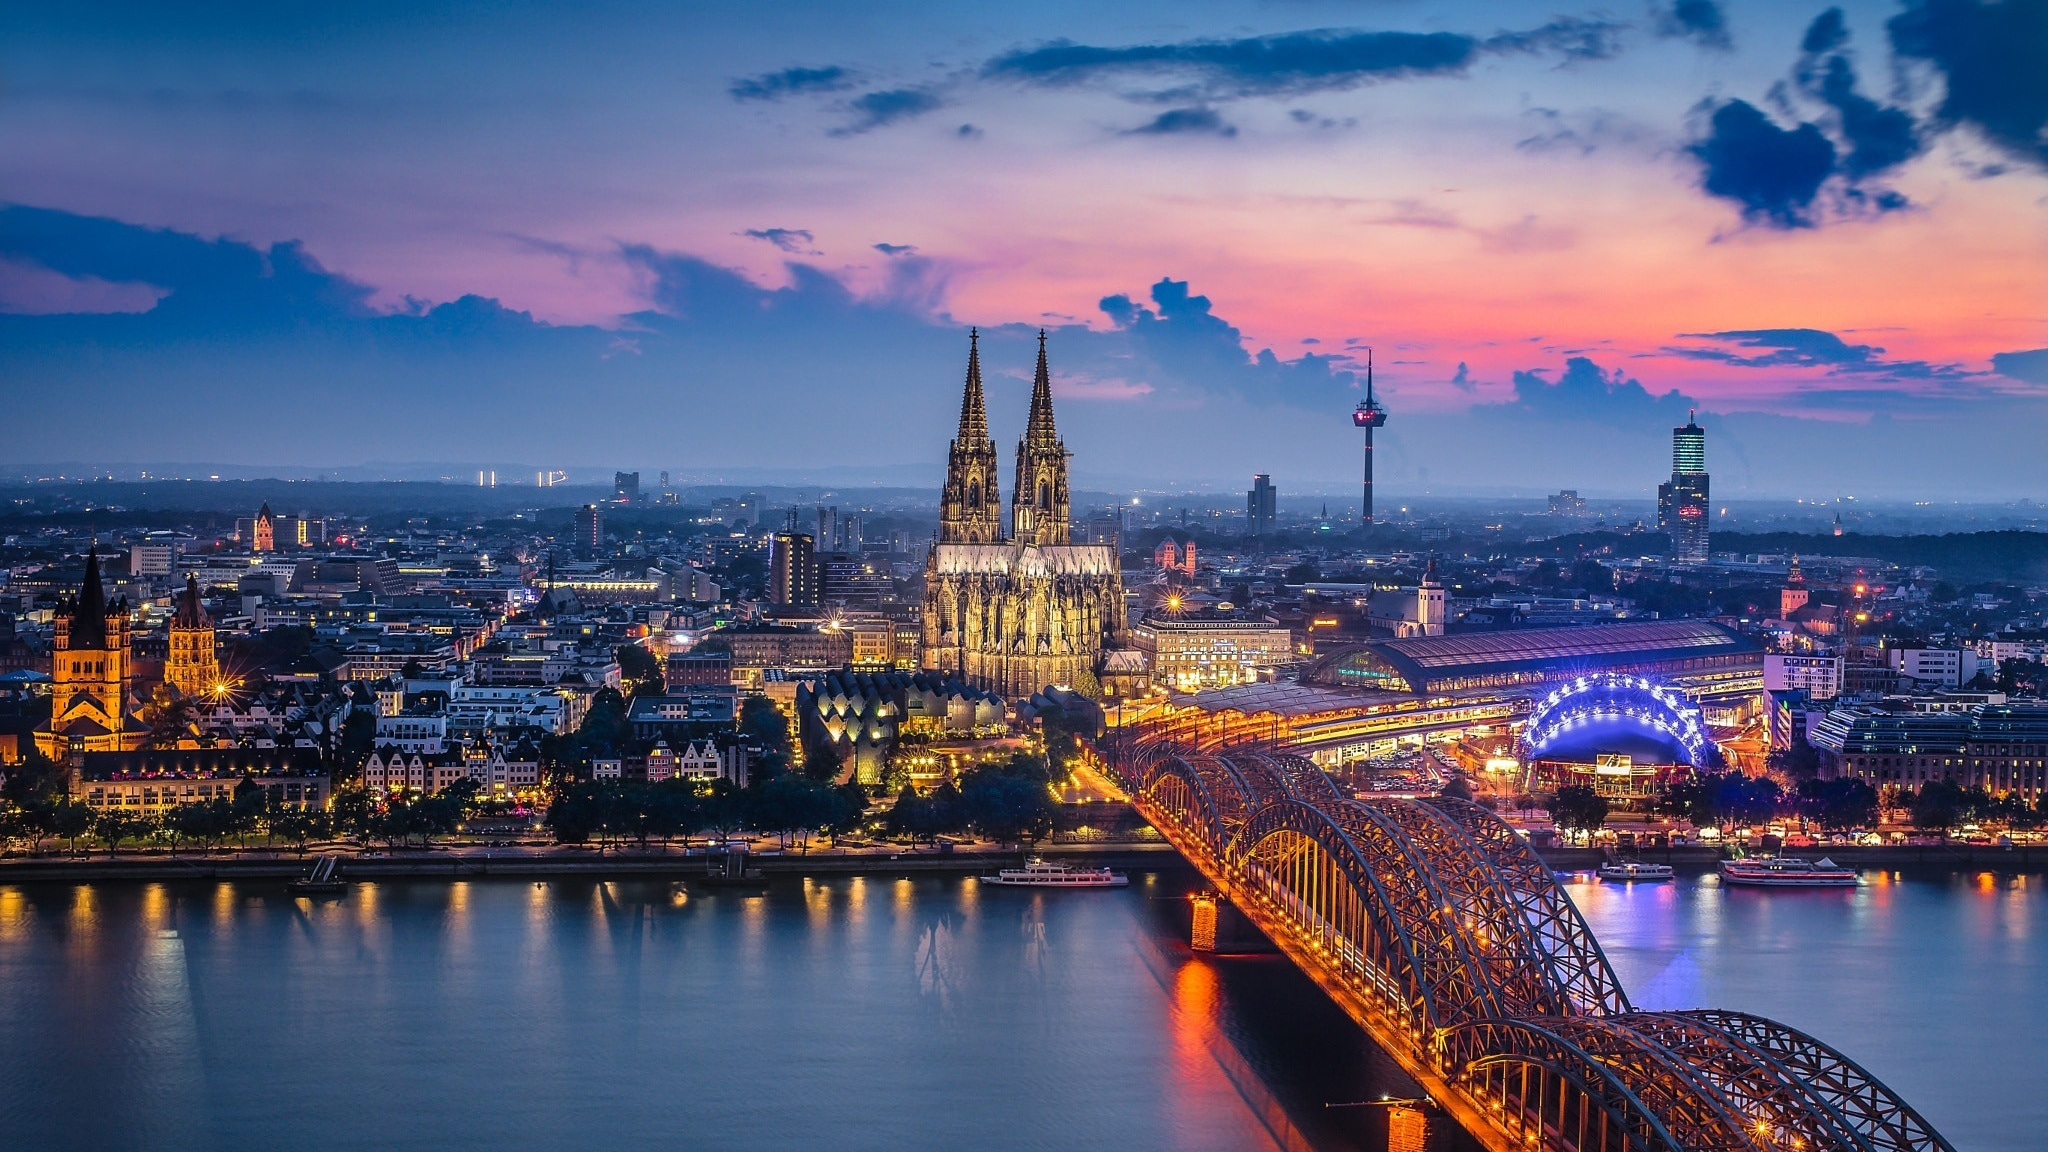 2048x1152 Germany Cologne Bridge Building City 2048x1152 ...